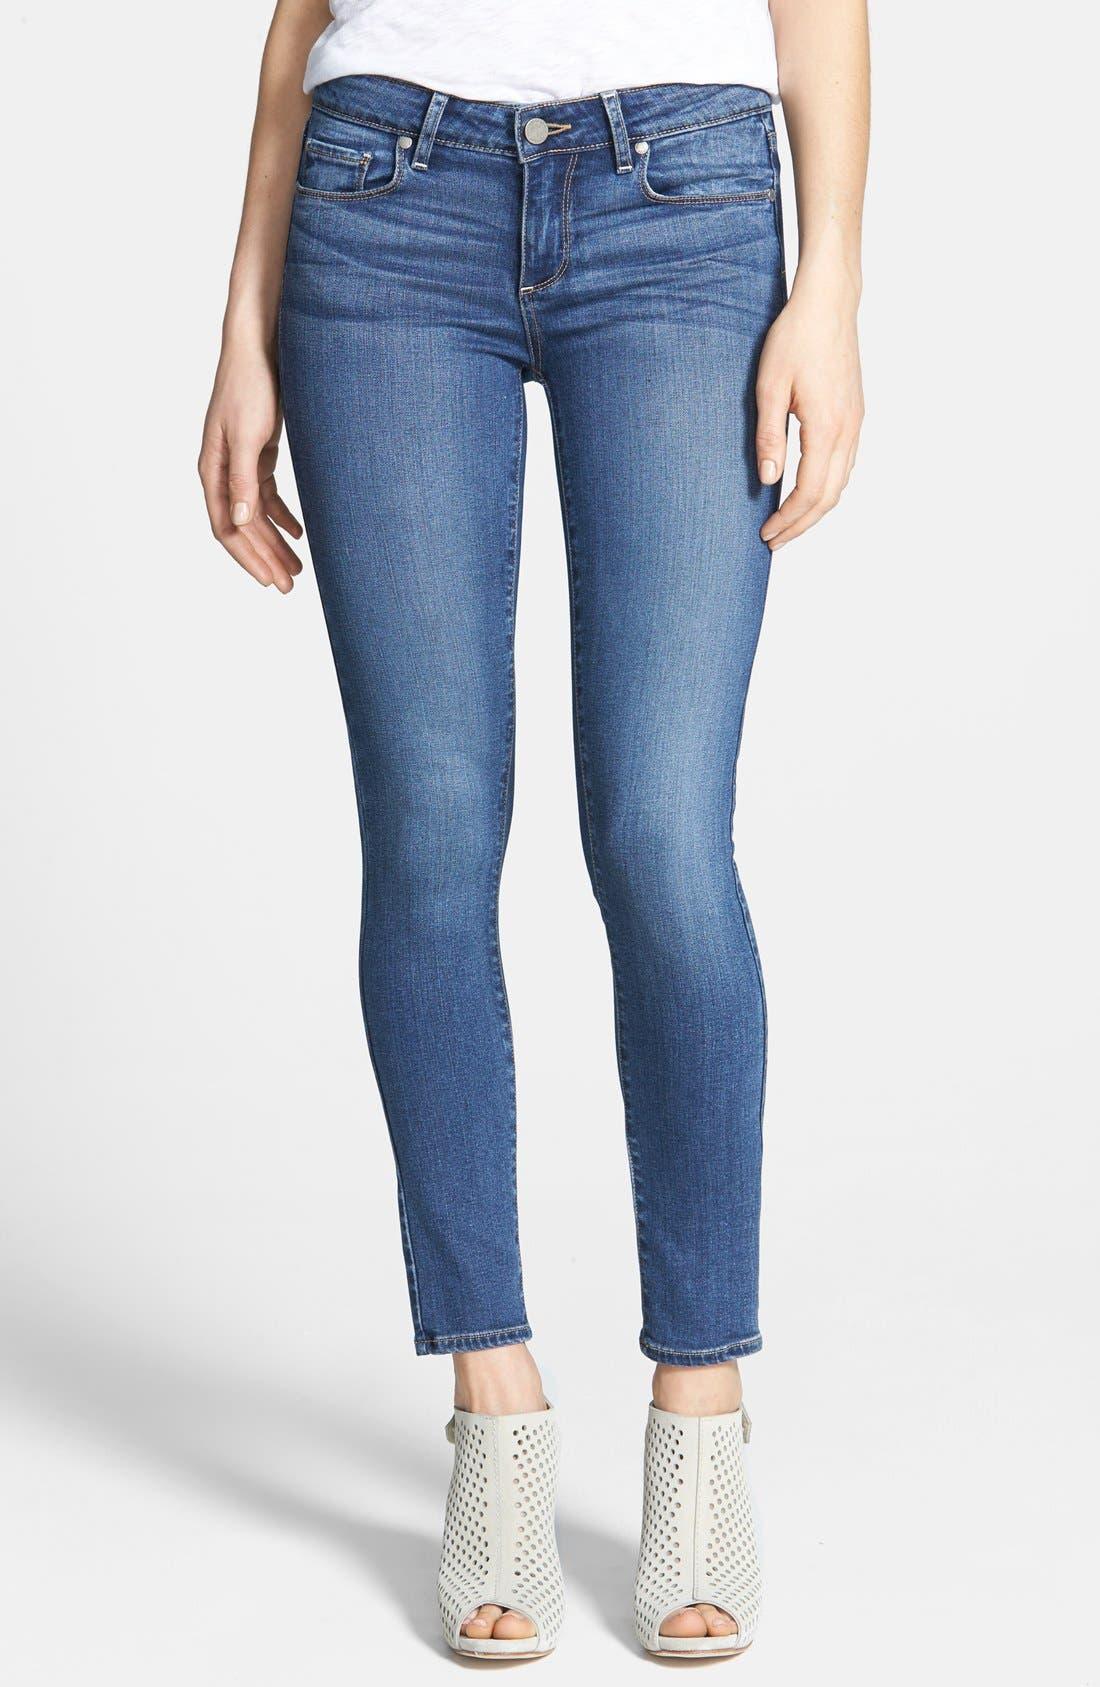 Main Image - PAIGE Transcend - Verdugo Ankle Skinny Jeans (Tristan)